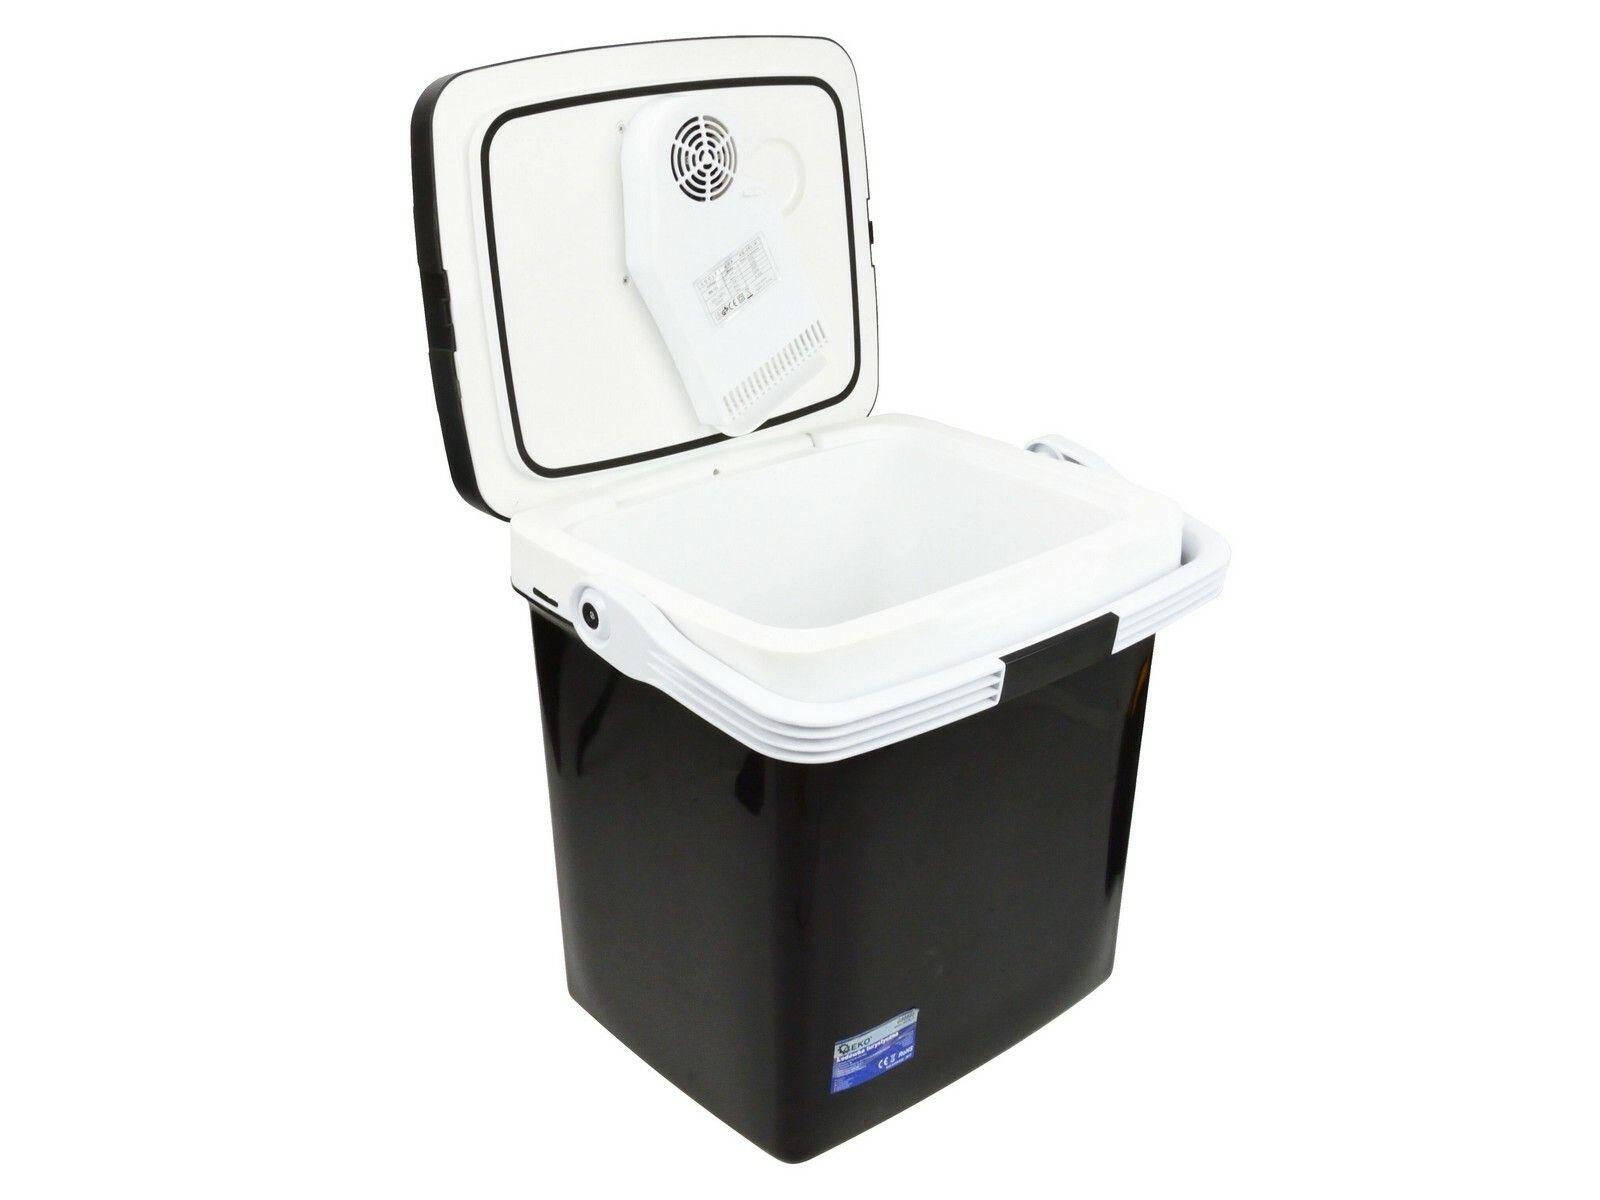 Chladící box 26litrů, 230/12V, displej s teplotou GEKO